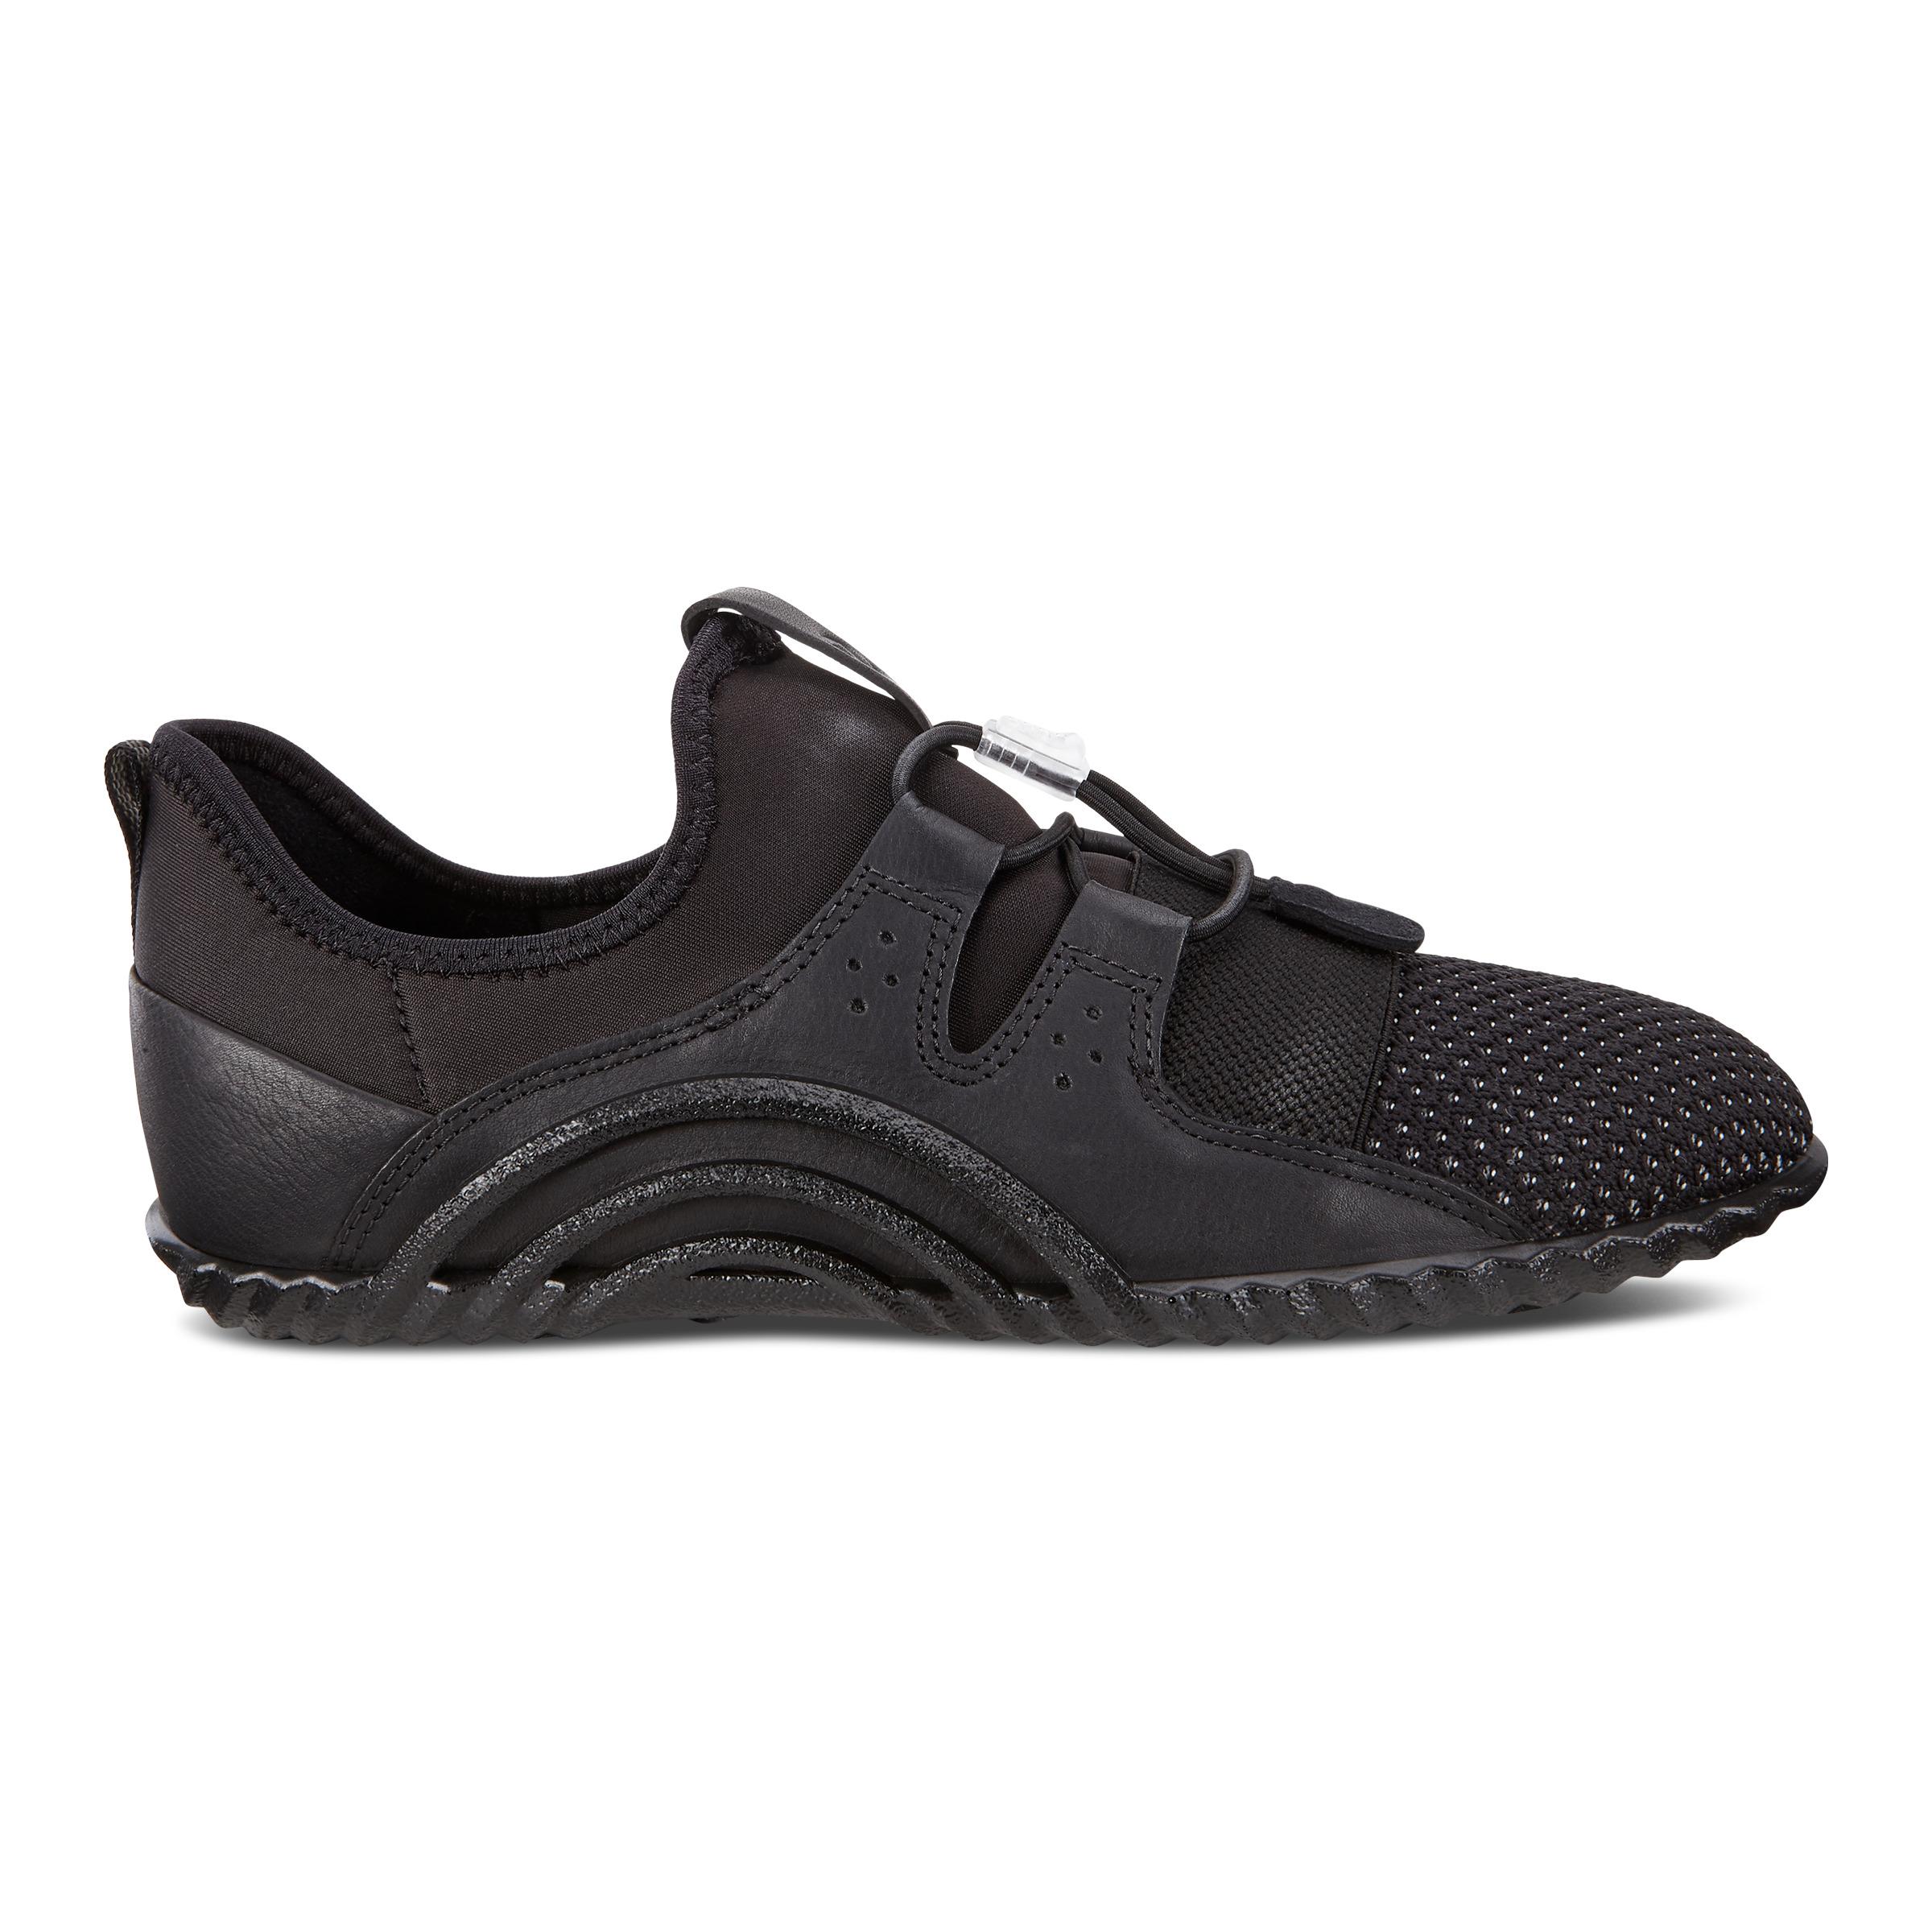 ECCO Vibration 1.0 Shoe Sneakers Size 8-8.5 Black